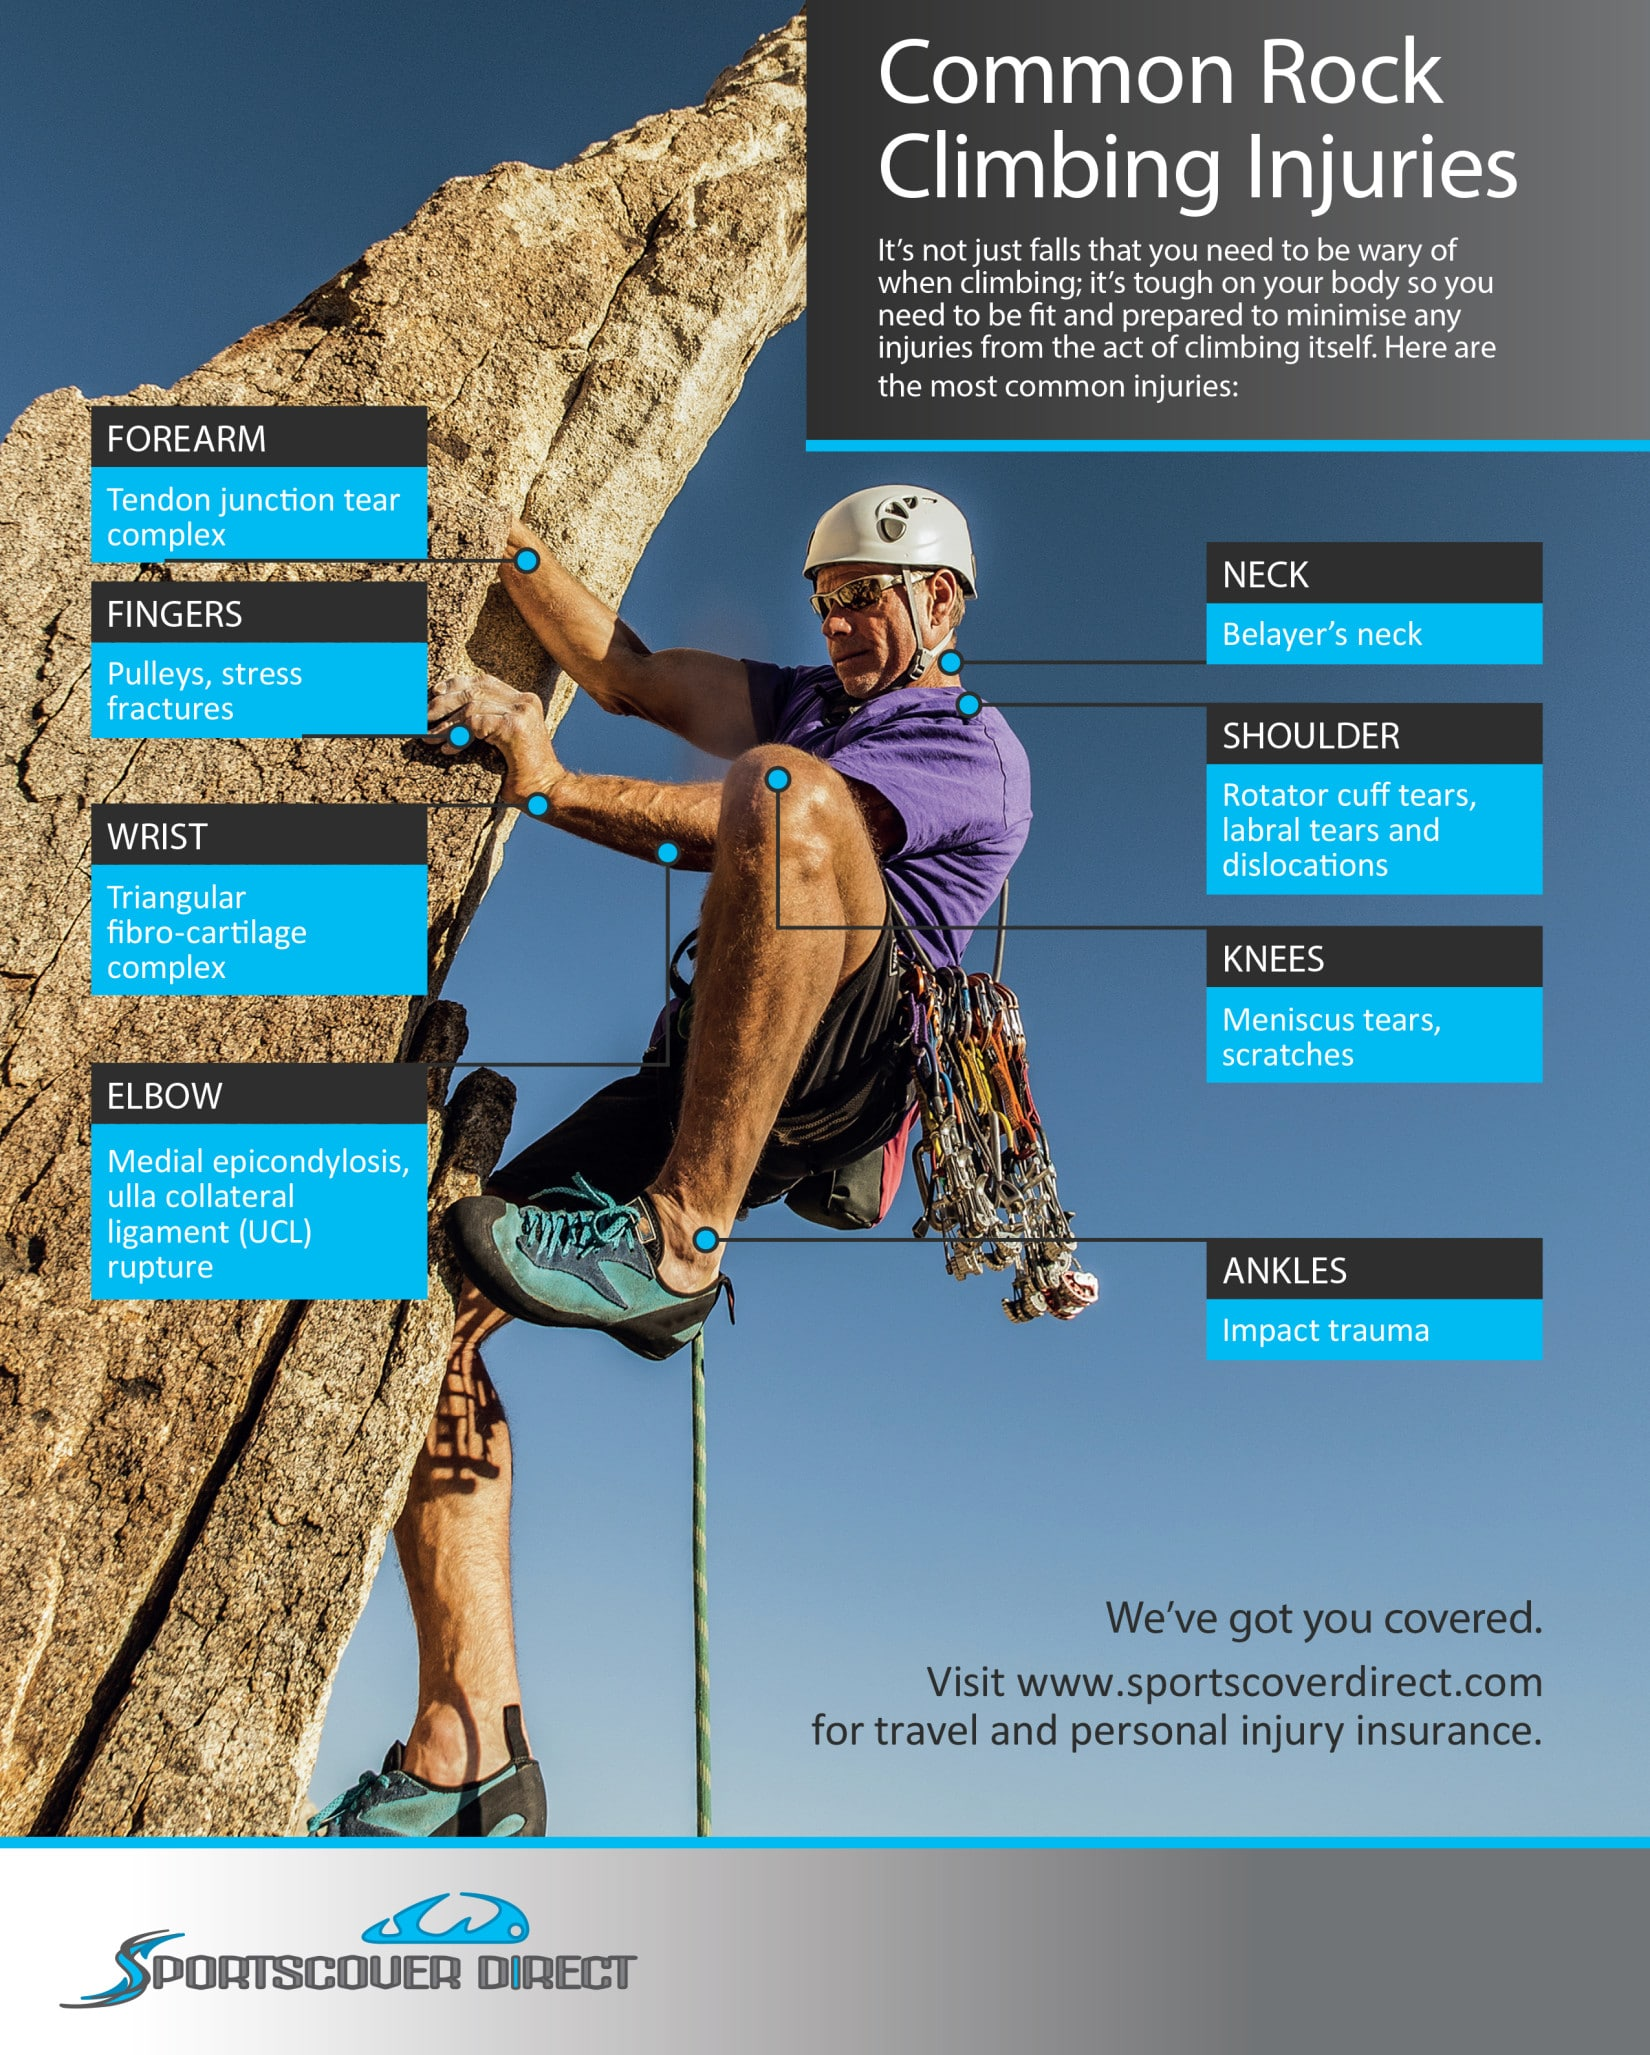 Common Rock Climbing Injuries